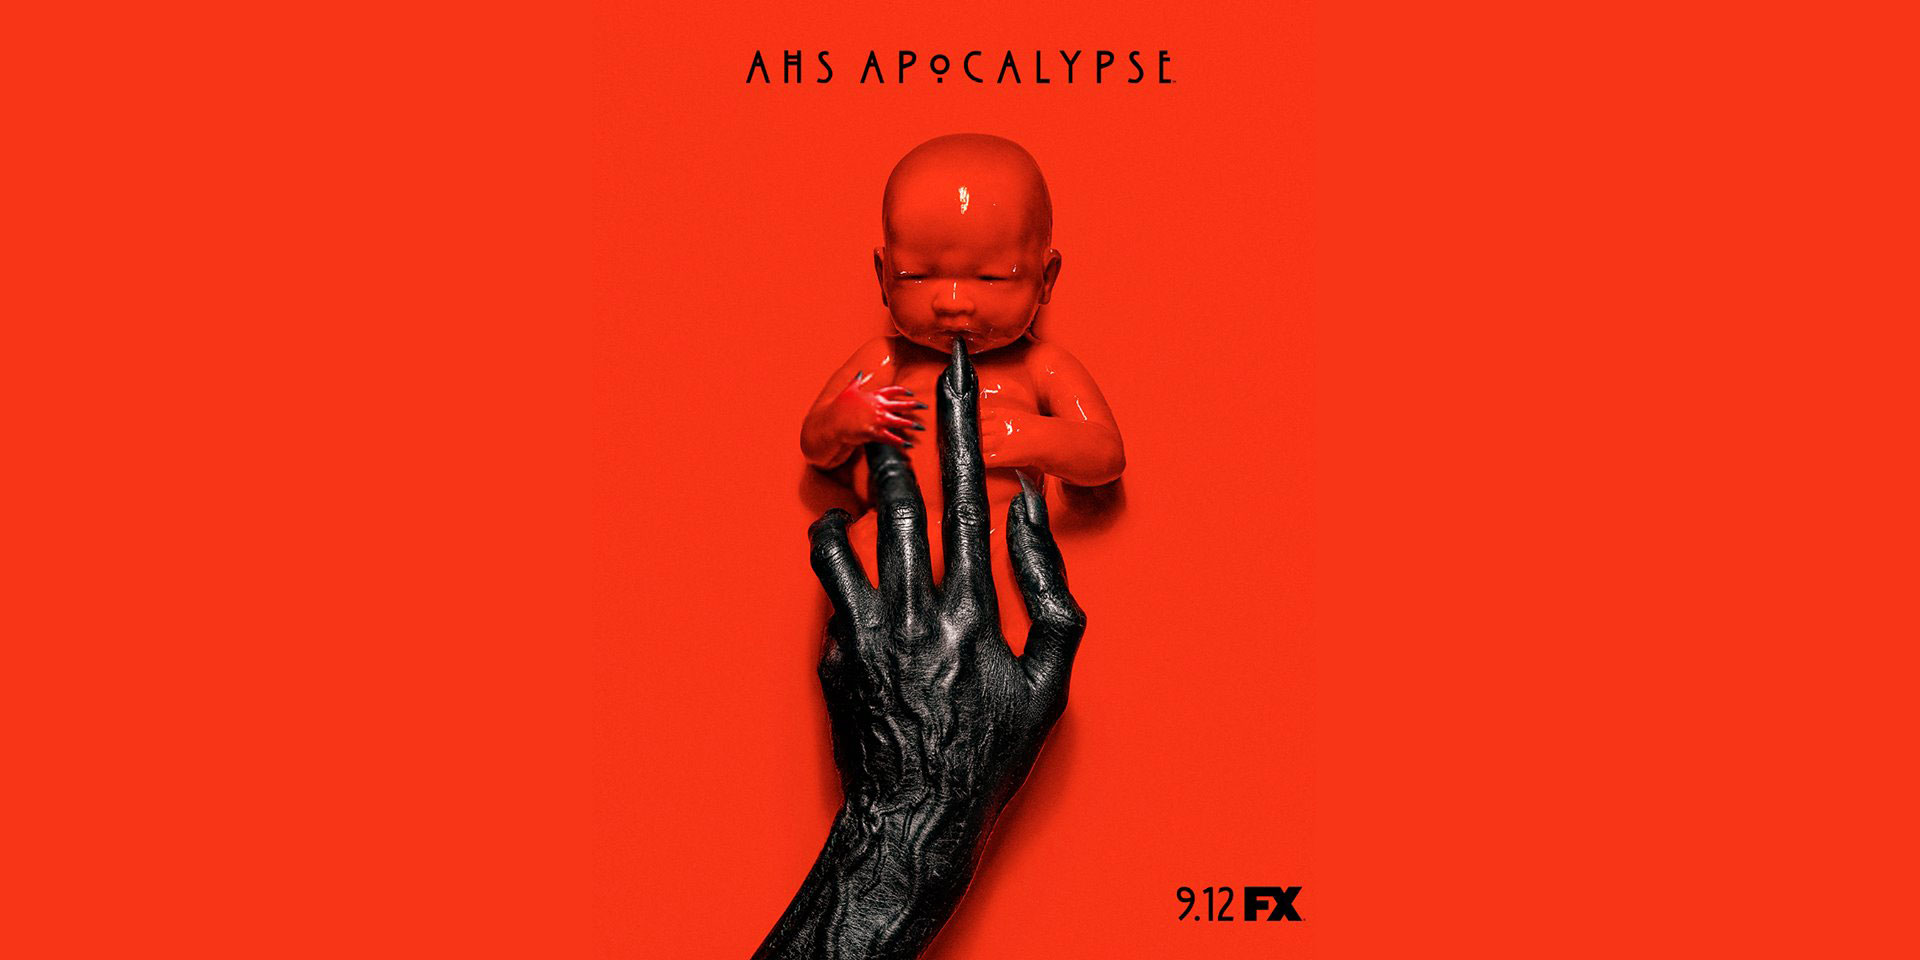 american horror story apocalypse season 9